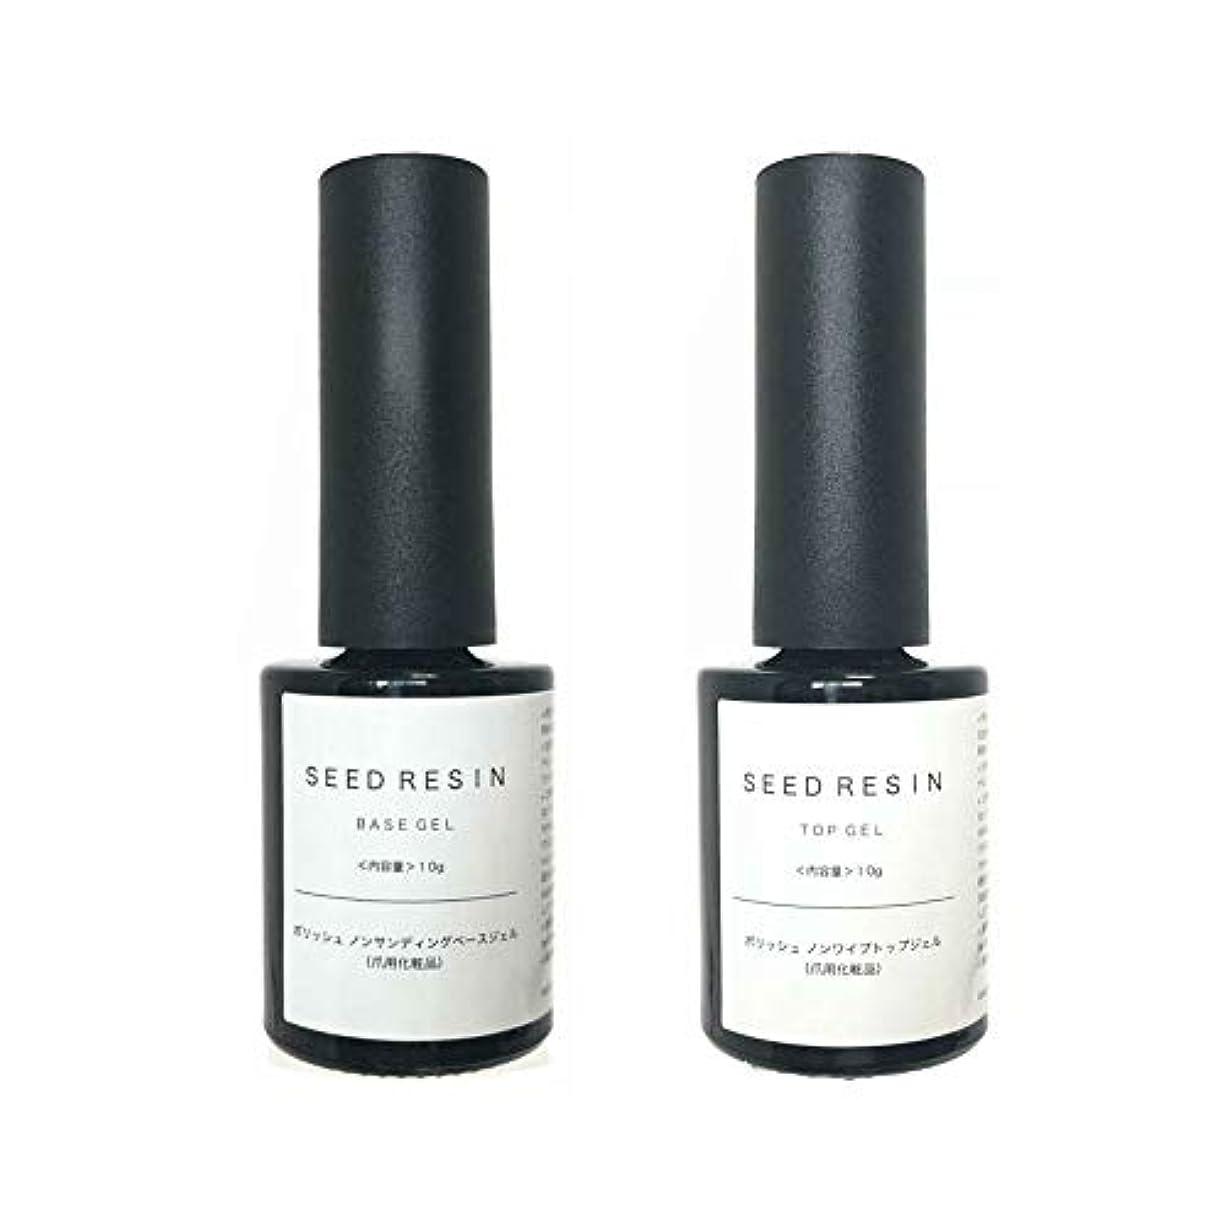 SEED RESIN(シードレジン) ジェルネイル ポリッシュ ノンサンディングベースジェル10g&ノンワイプトップジェル10g セット